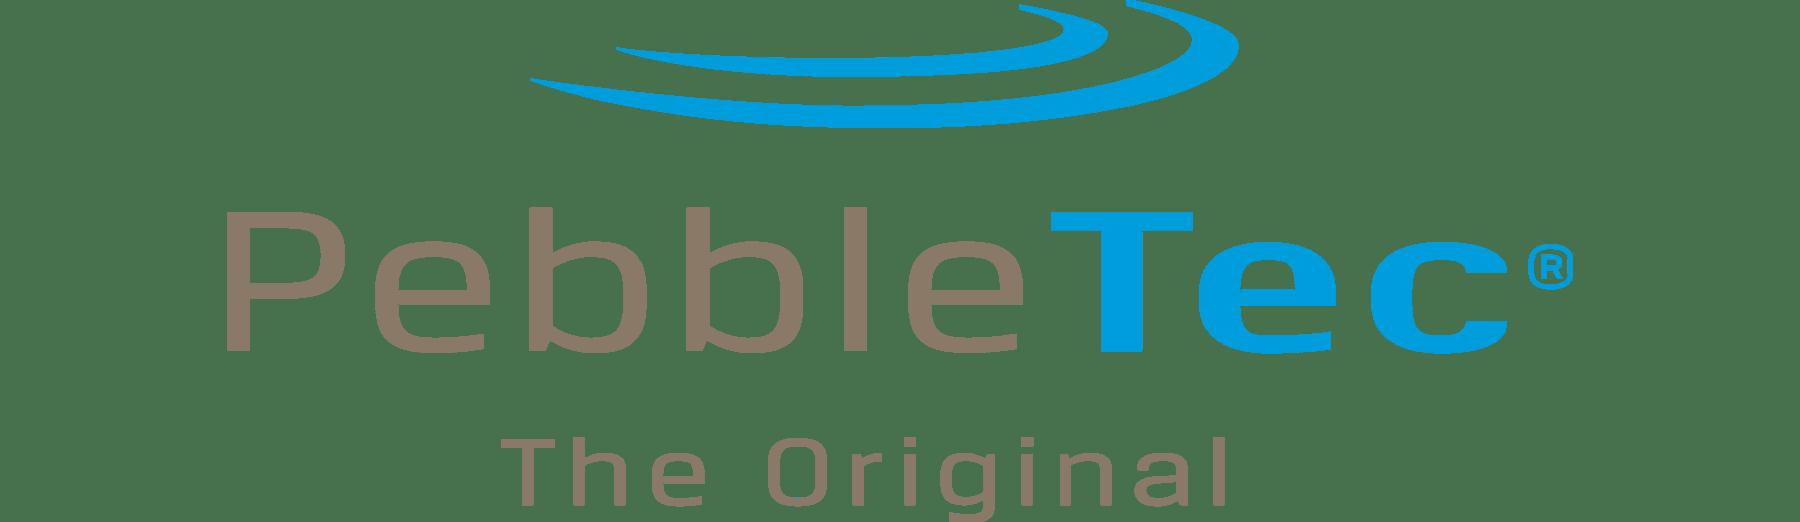 PebbleTec pool surfaces logo